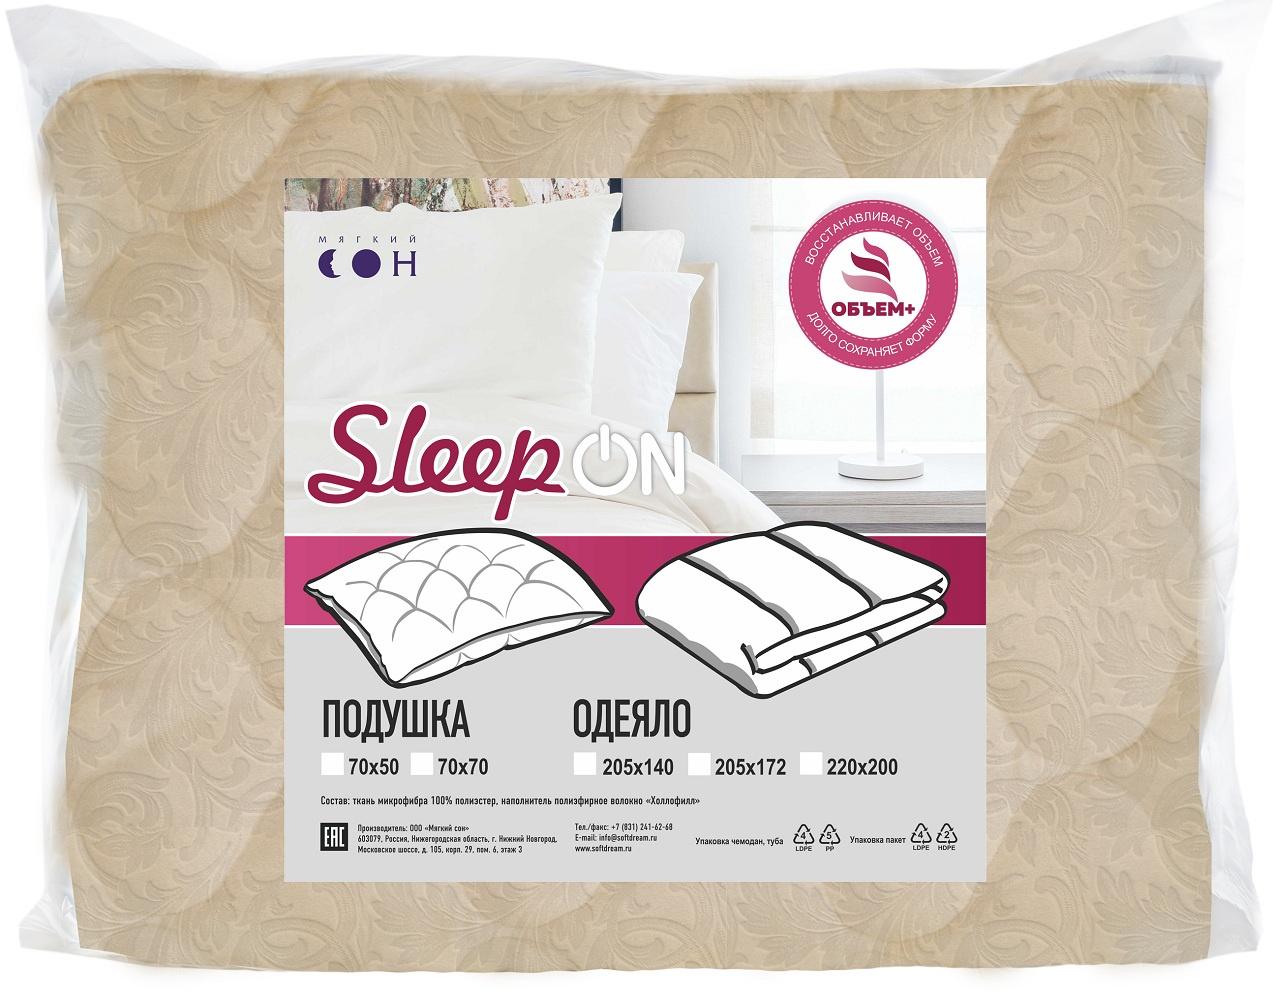 Одеяло Мягкий Сон SleepOn стеганое, цвет: бежевый, 200 х 220 см цена